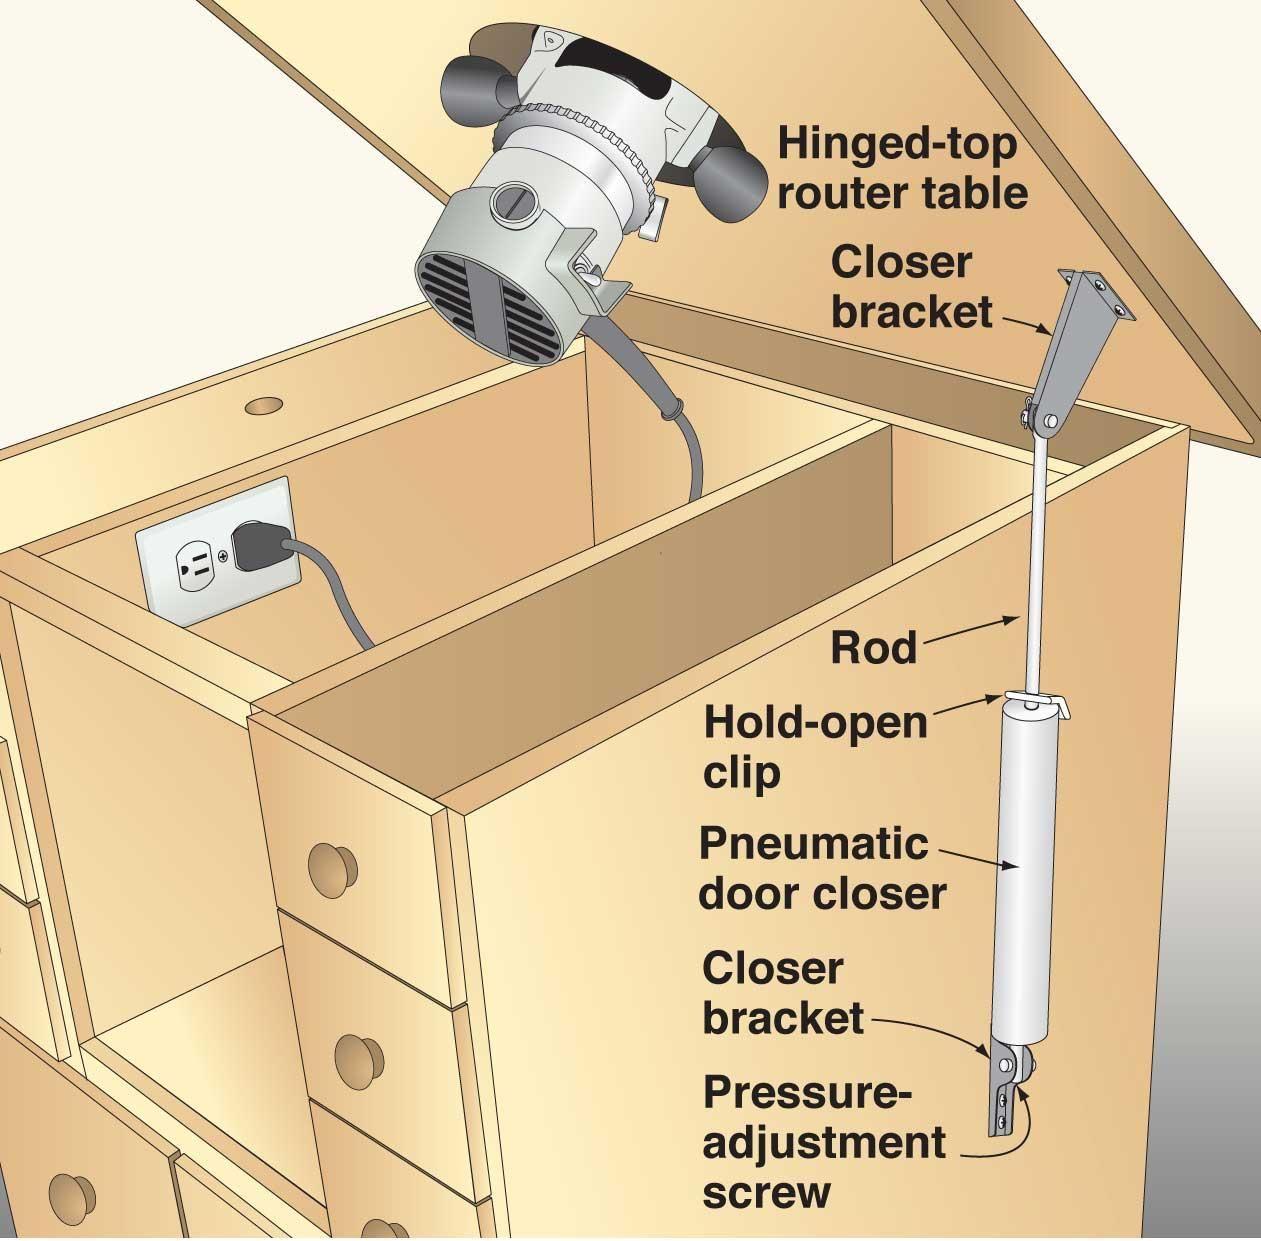 Lift assist help for tilt top router tables wood magazine lift assist help for tilt top router tables wood magazine greentooth Gallery